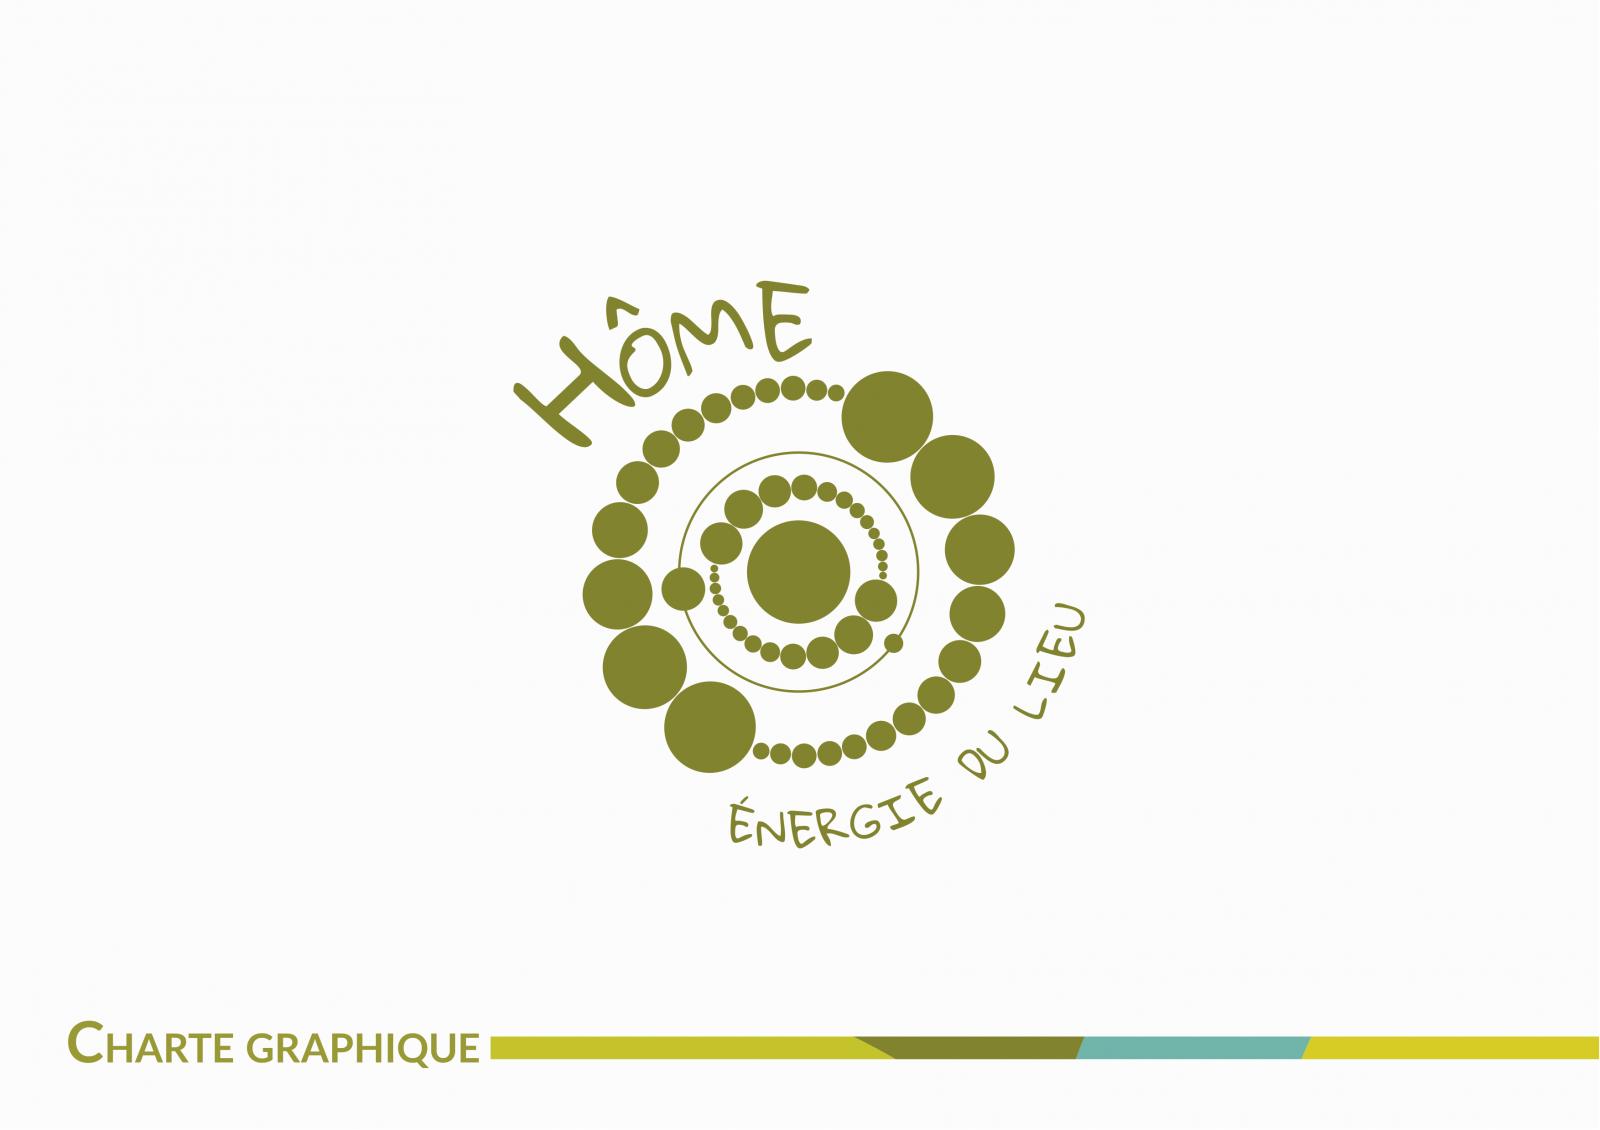 0_Hôme, énergie du lieu